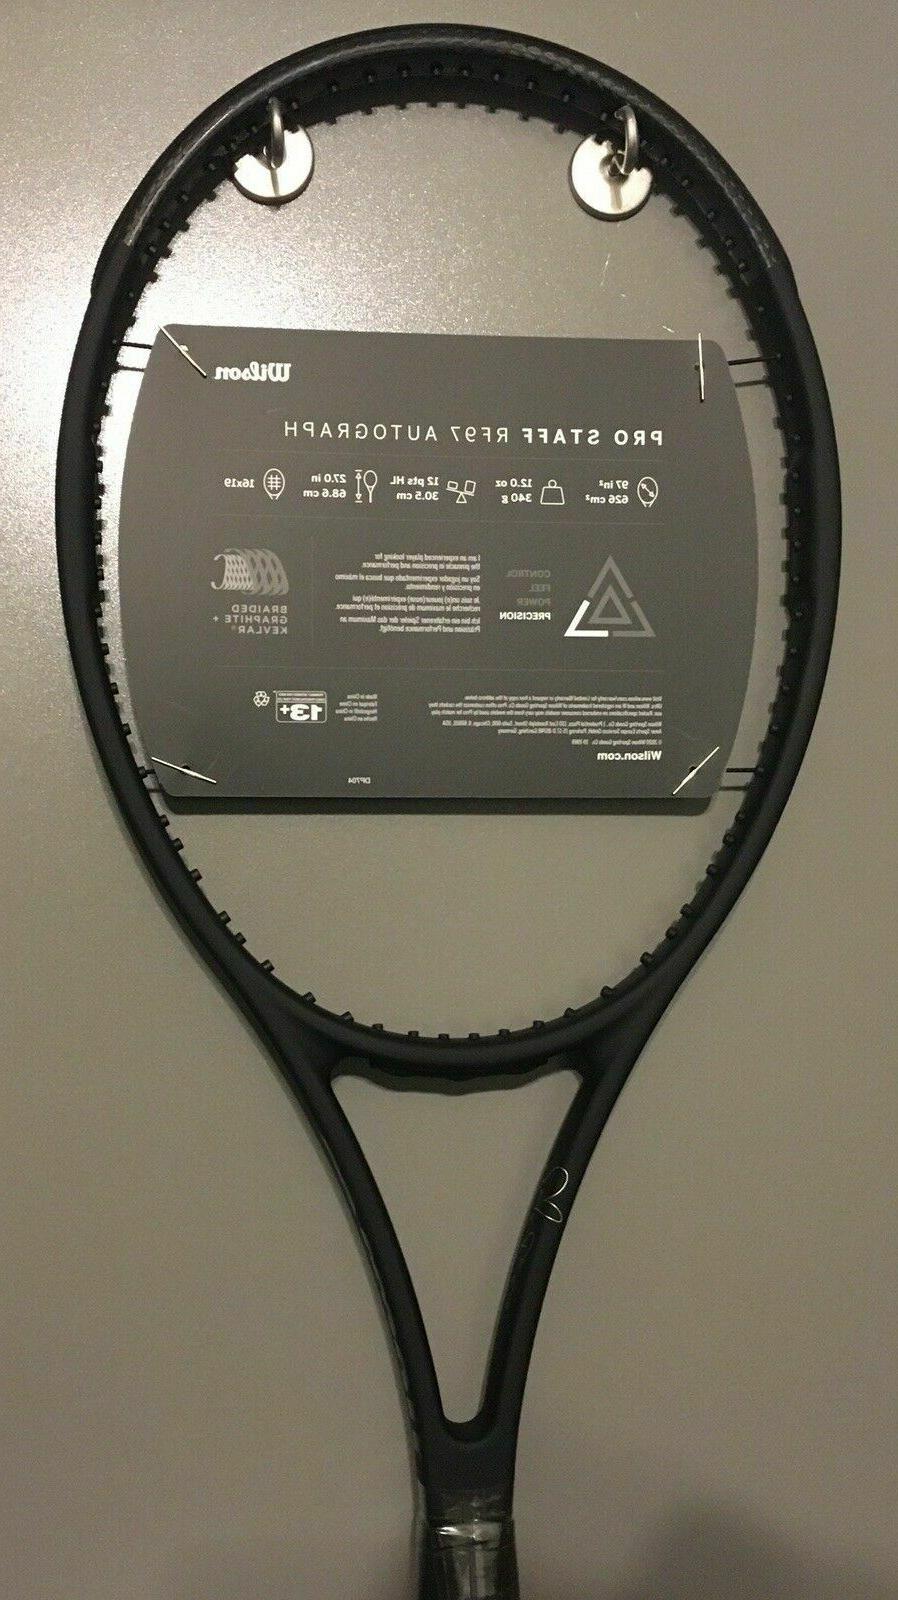 New Wilson Staff Racket